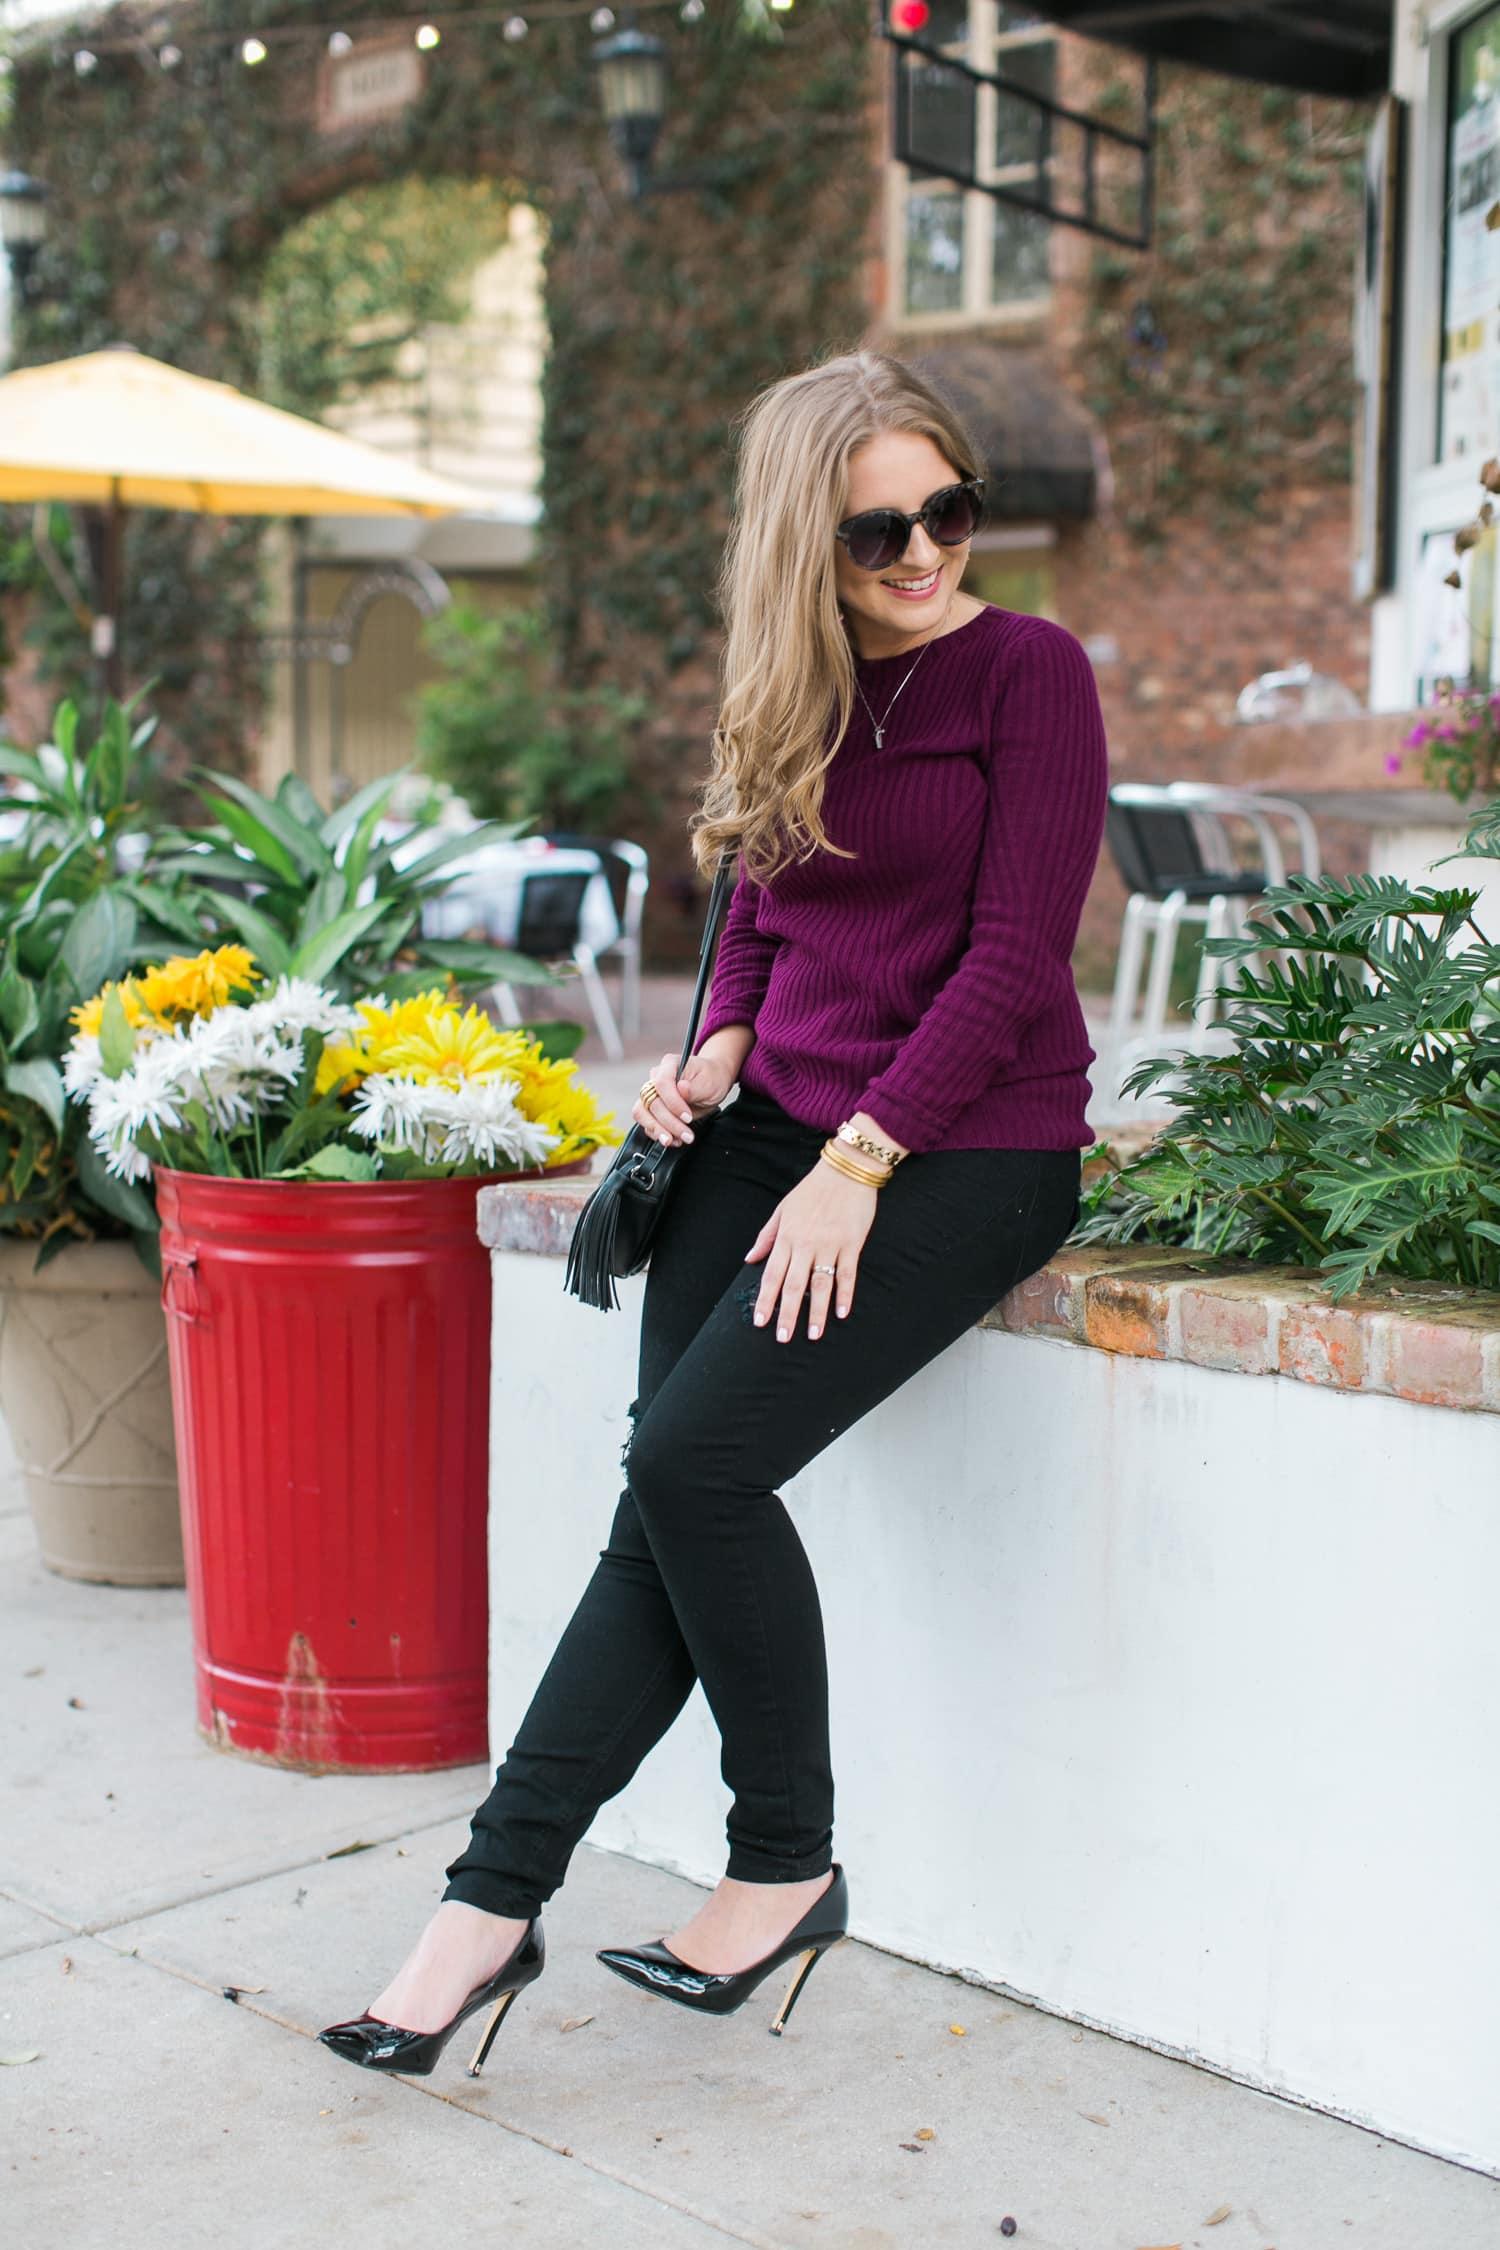 black-ripped-jeans-retro-round-sunglasses-burgundy-cashmere-sweater-black-pointy-toe-pumps-tassel-handbag-ashley-brooke-nicholas-048